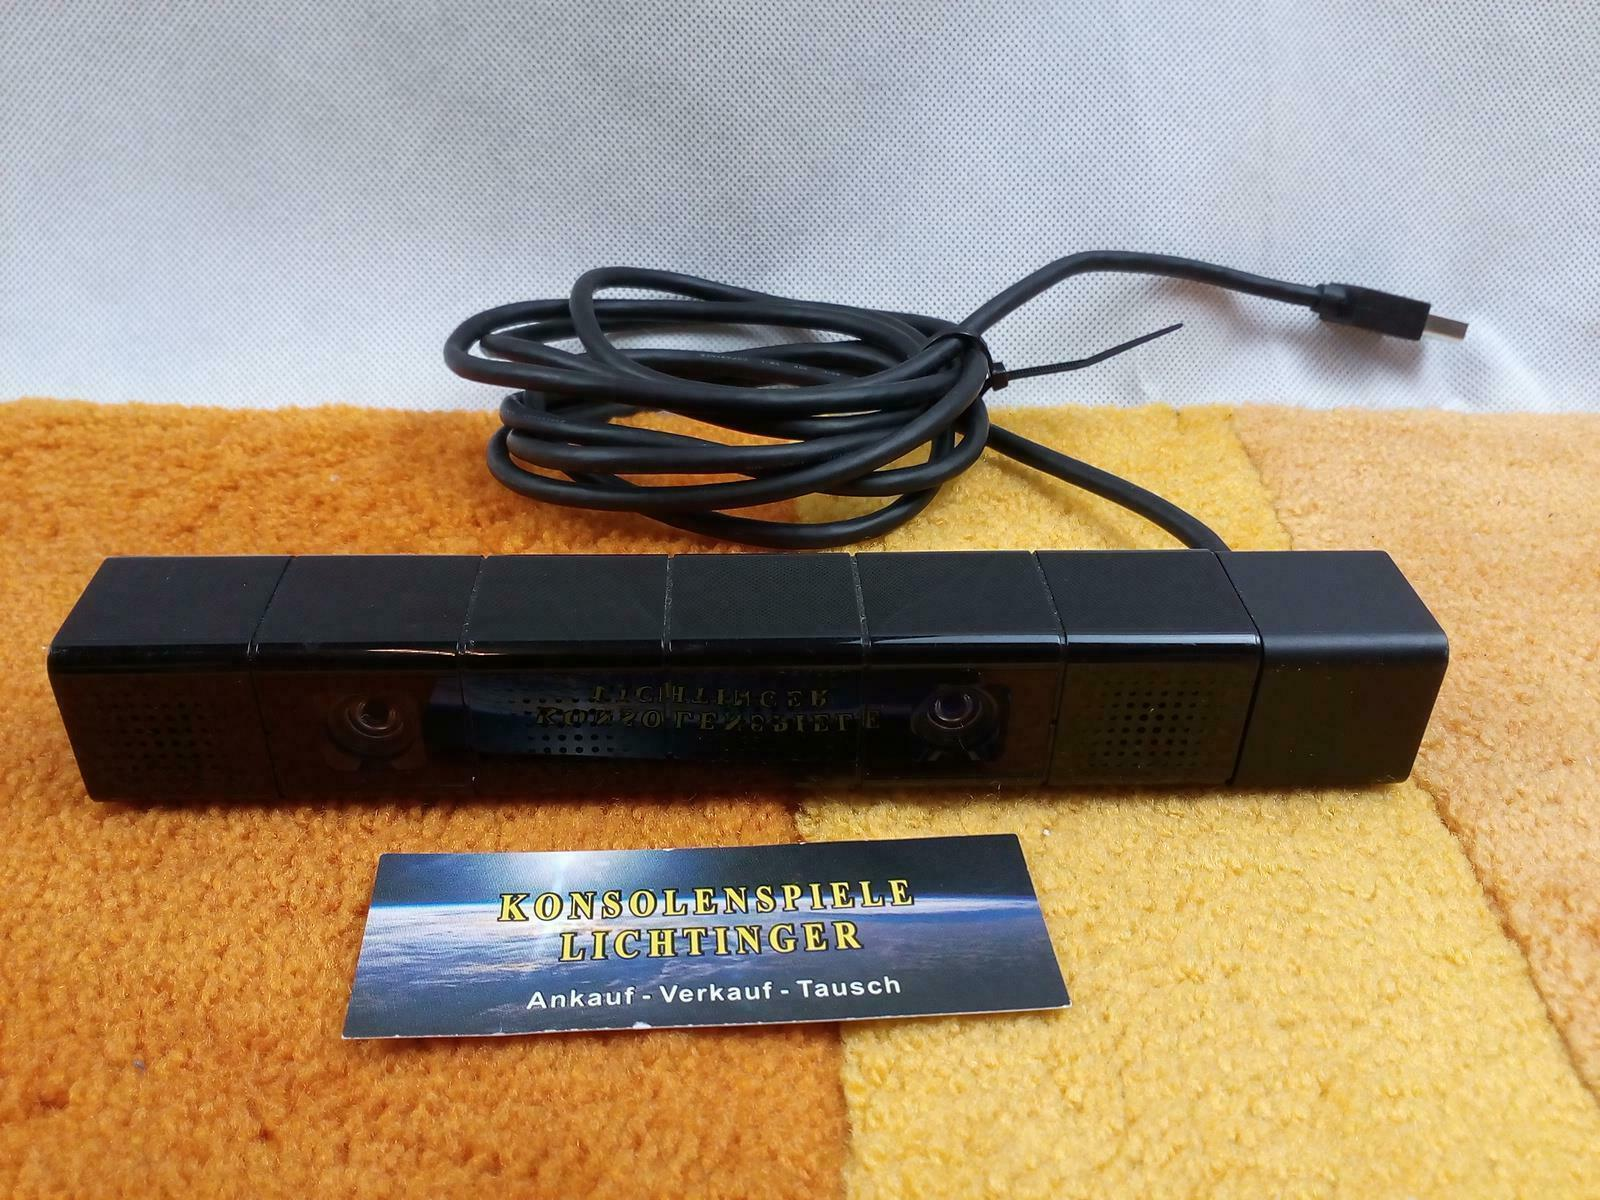 Camera/Camera Cam CUH-ZEY1 Black By Sony PS4/PLAYSTATION 4 Good